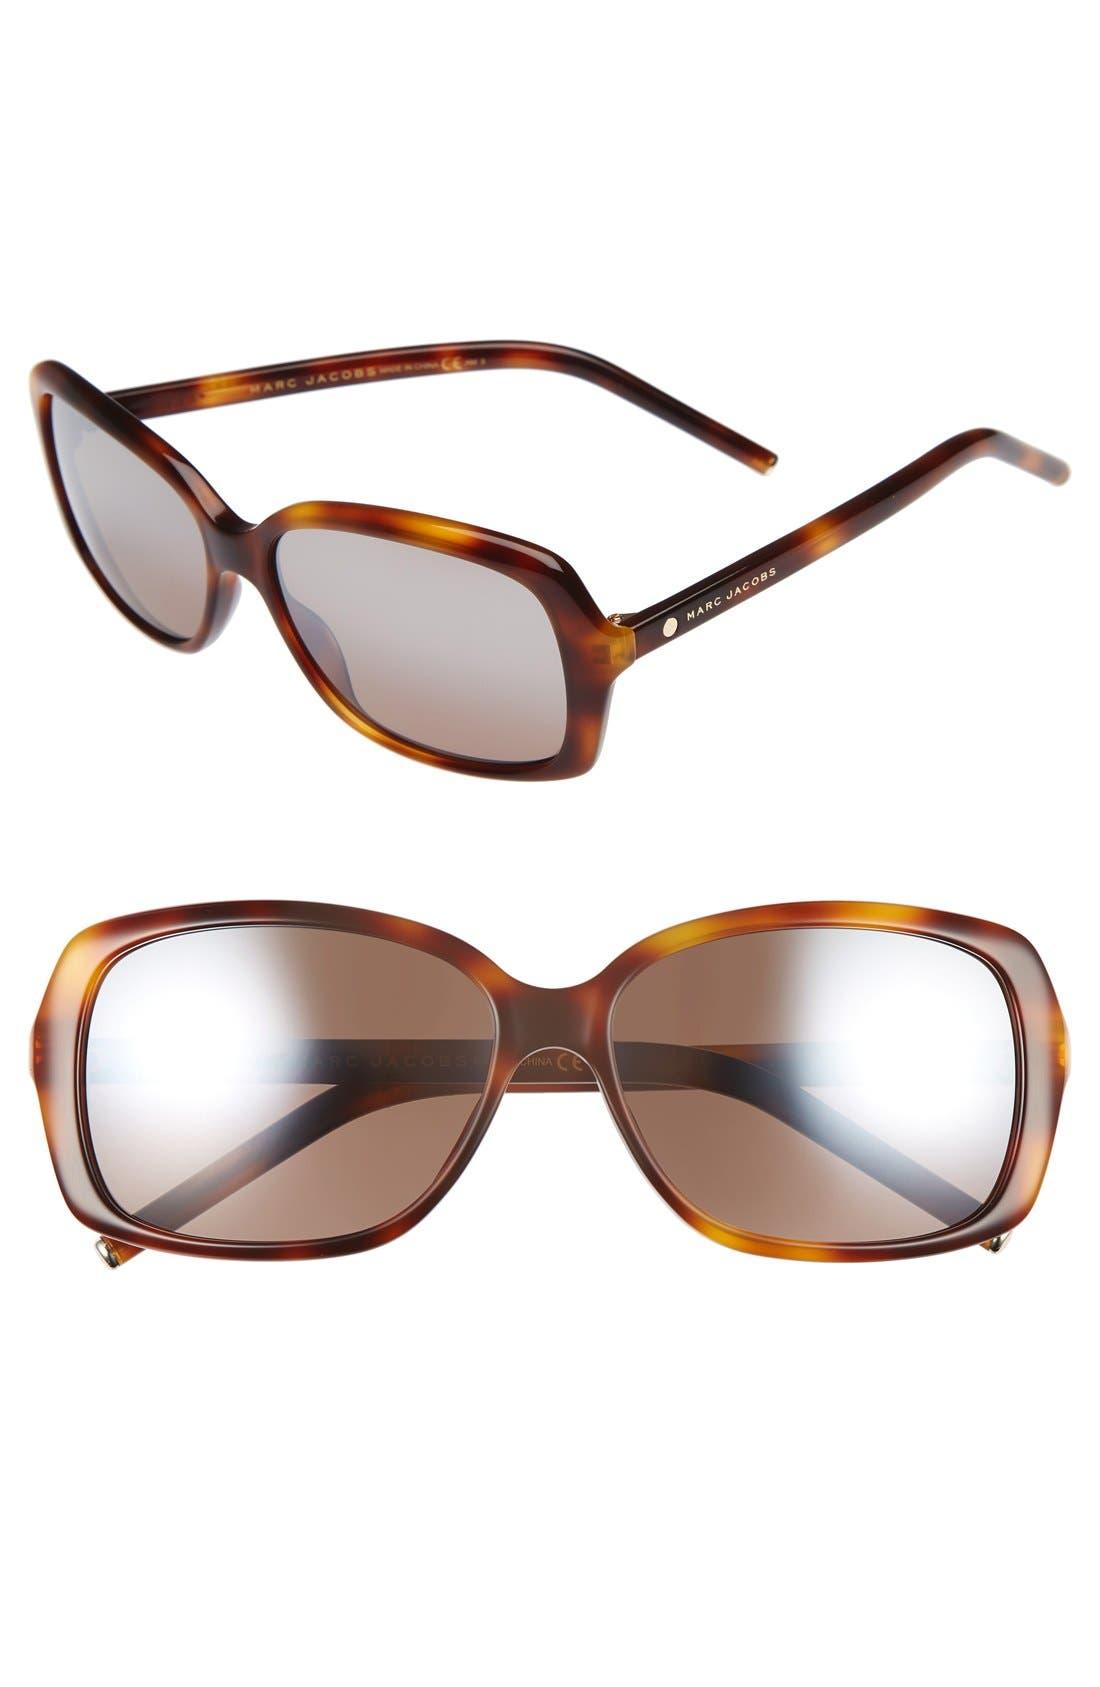 MARC JACOBS 57mm Sunglasses,                         Main,                         color, Havana